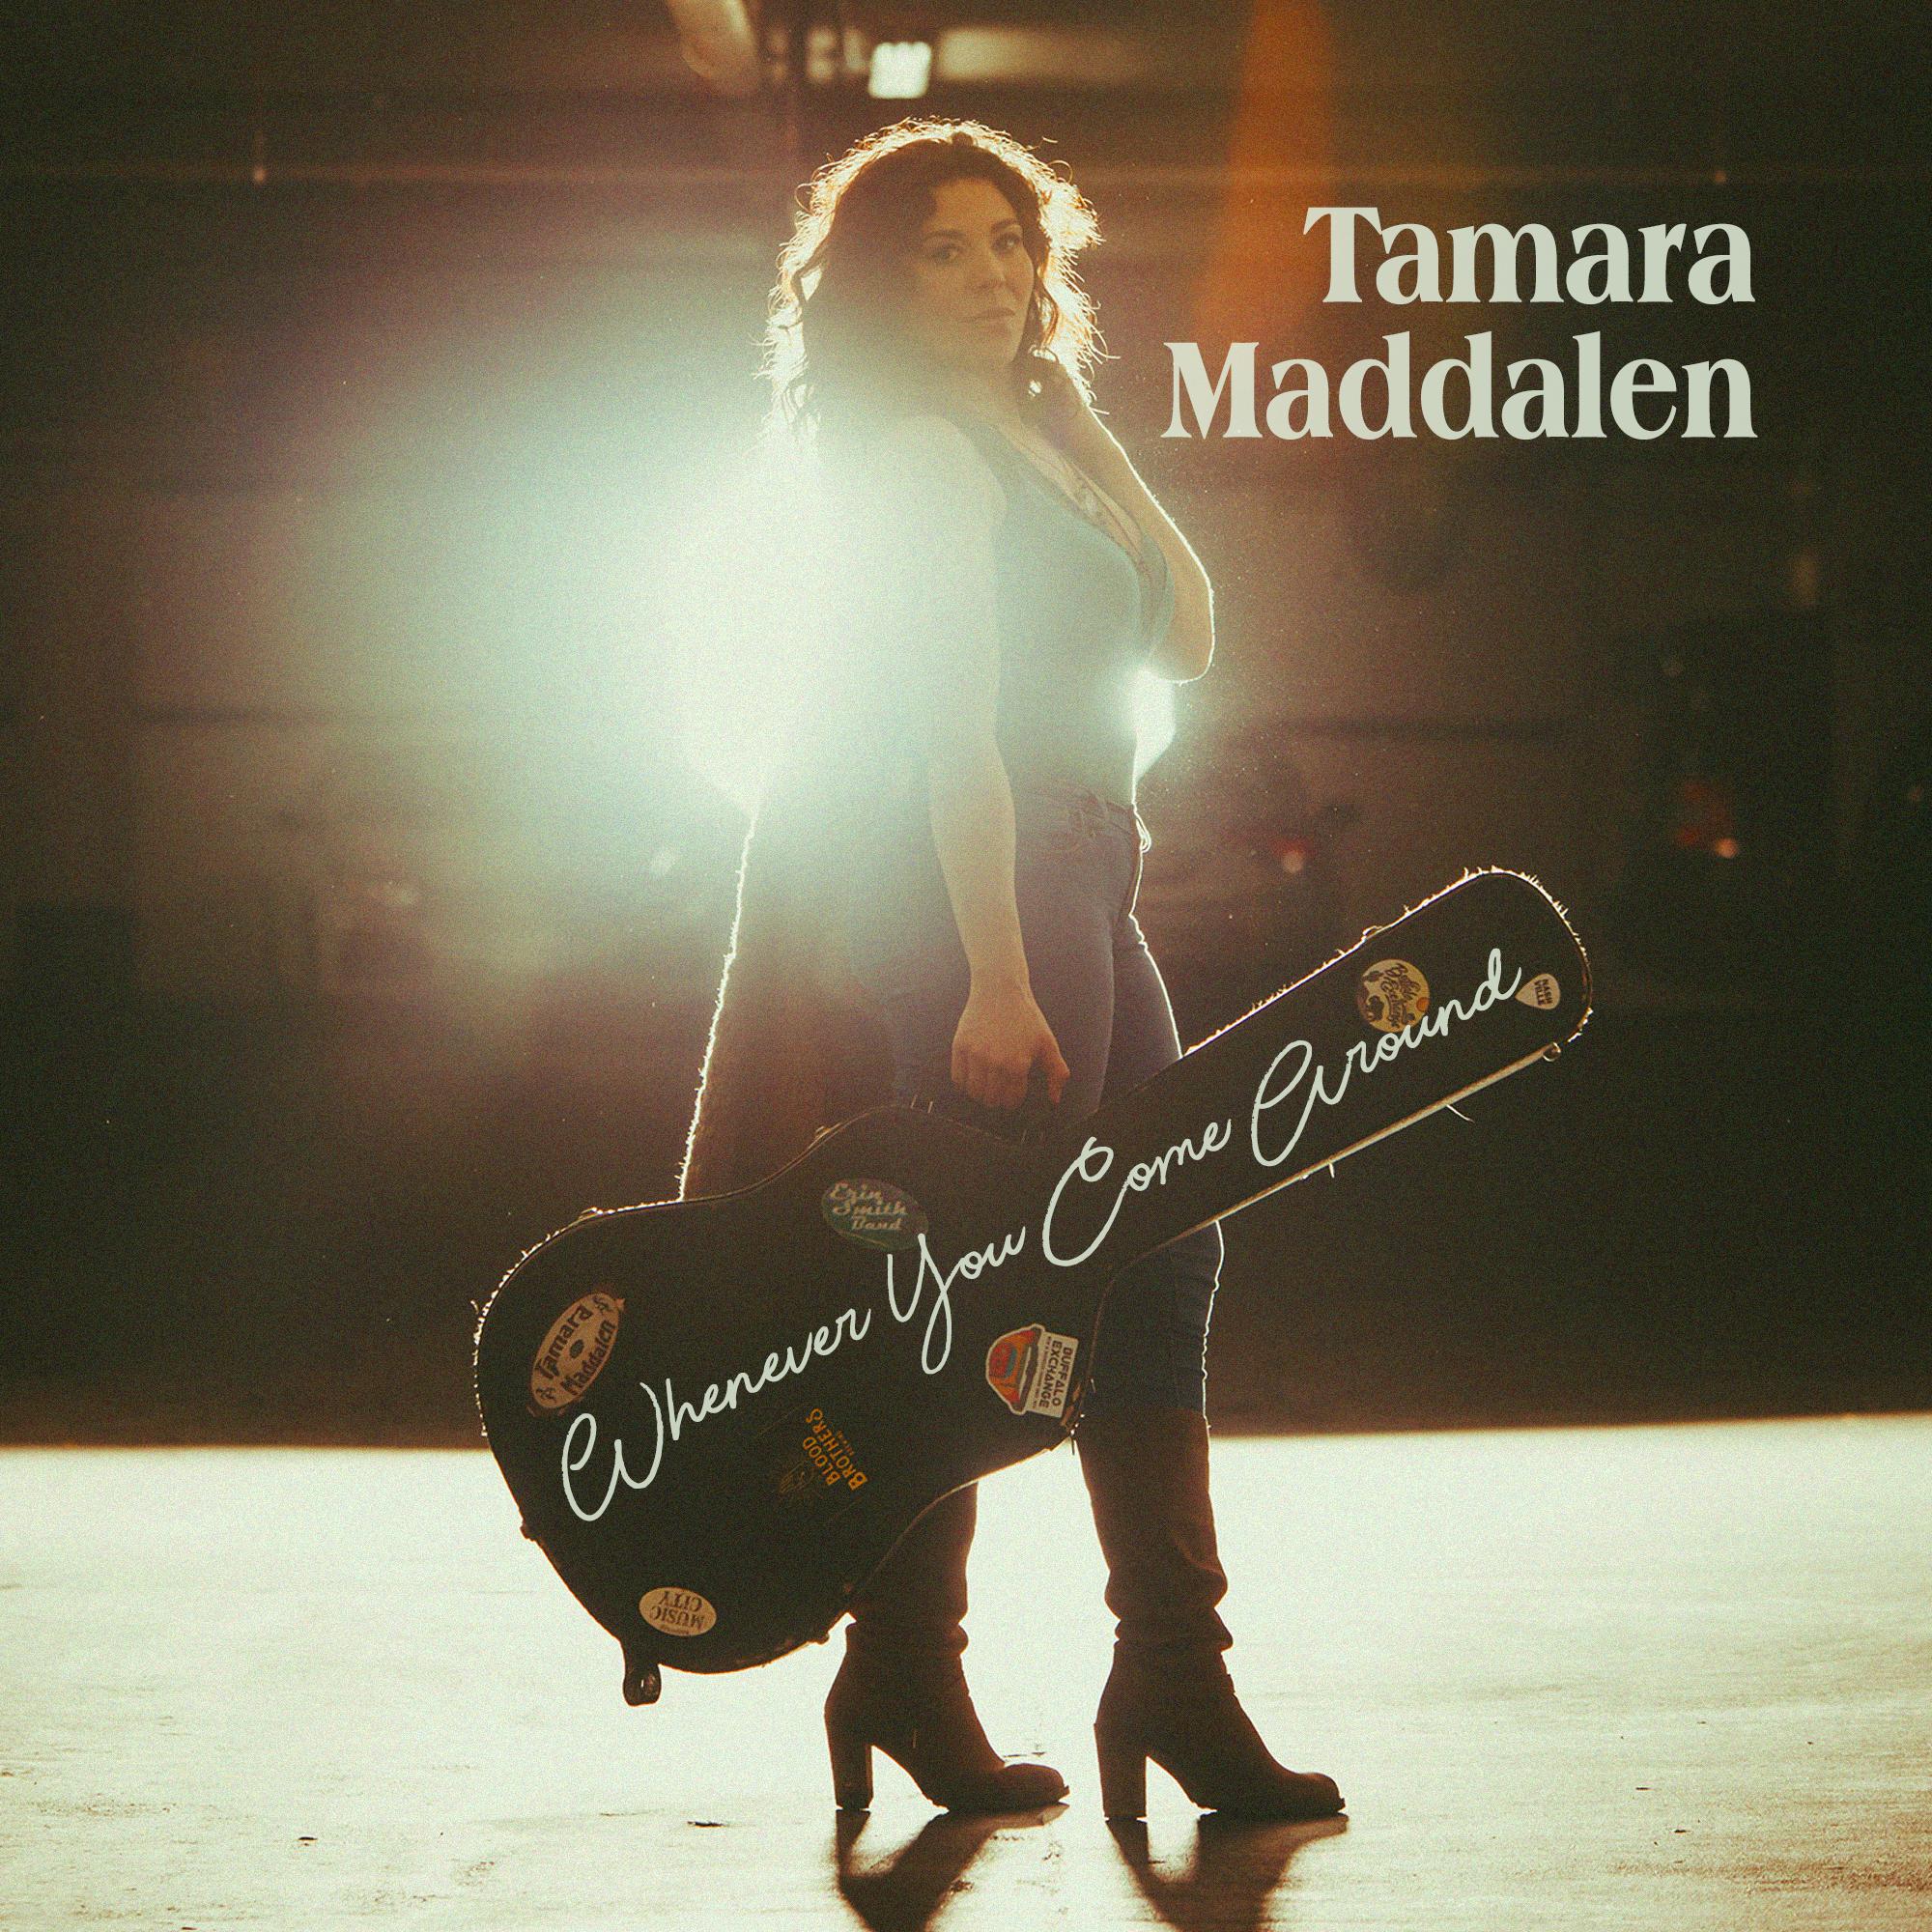 Whenever You Come Around - Tamara Maddalen